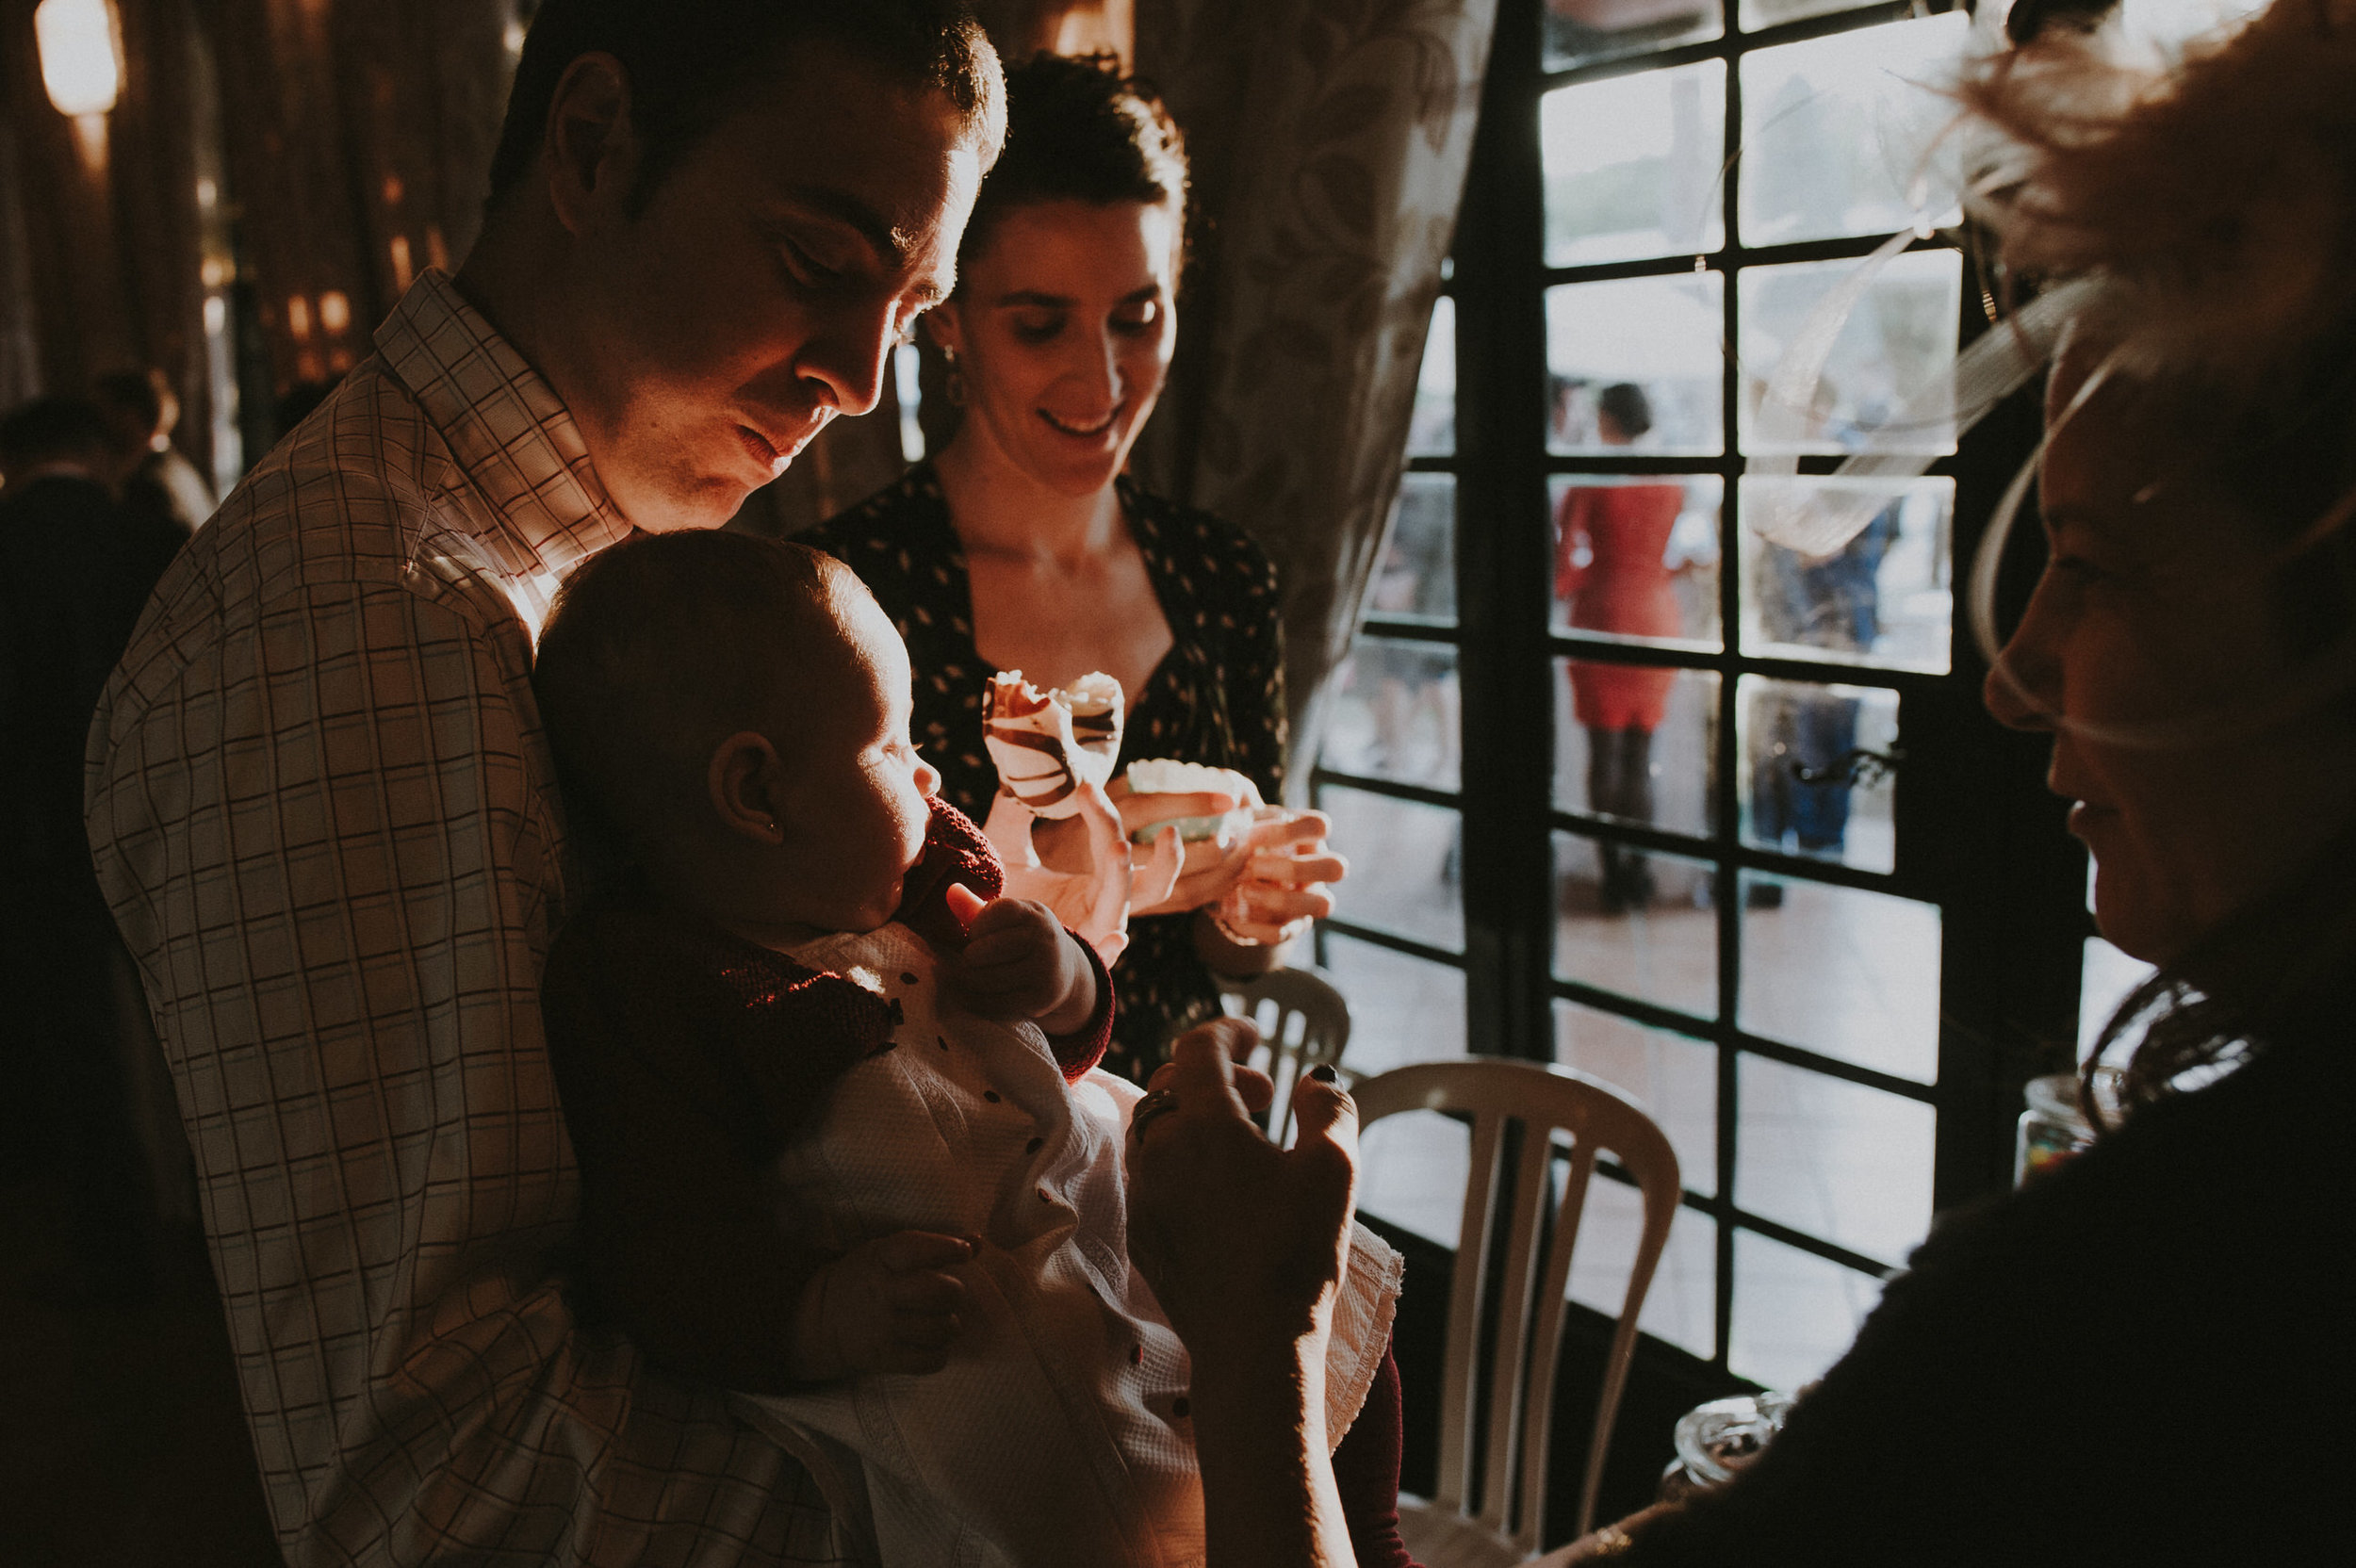 andres+amarillo+fotografo+boda+sevilla+santa+maria+de+la+blanca+al+yamanah (22).JPG